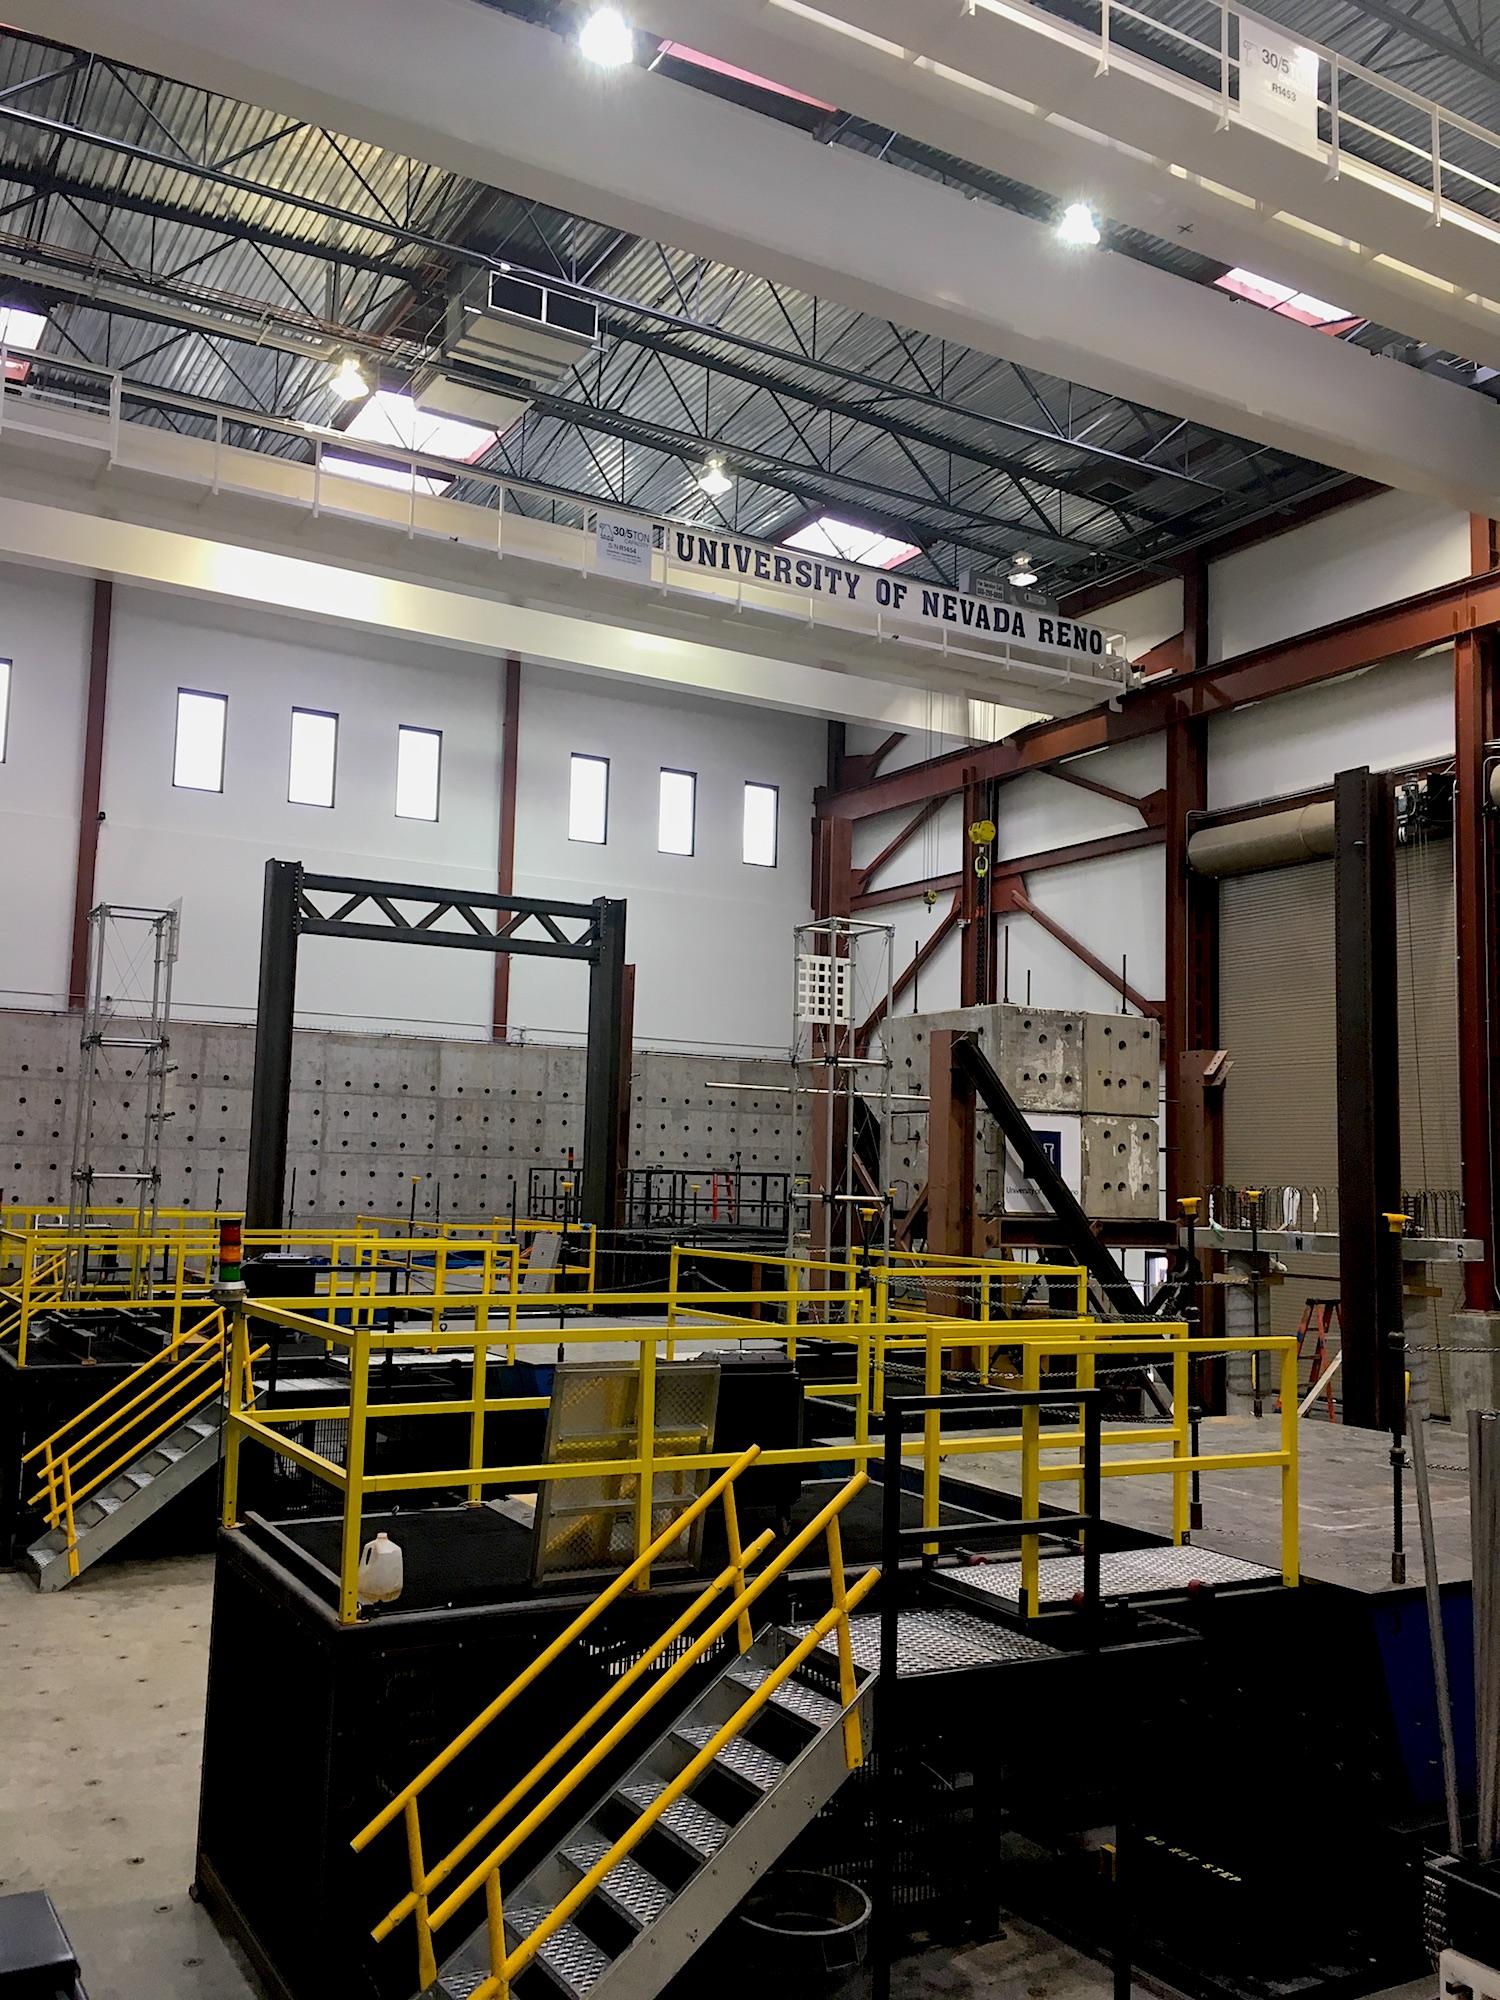 Rogers-Wiener-Large-Structures-Lab-UNR.jpg